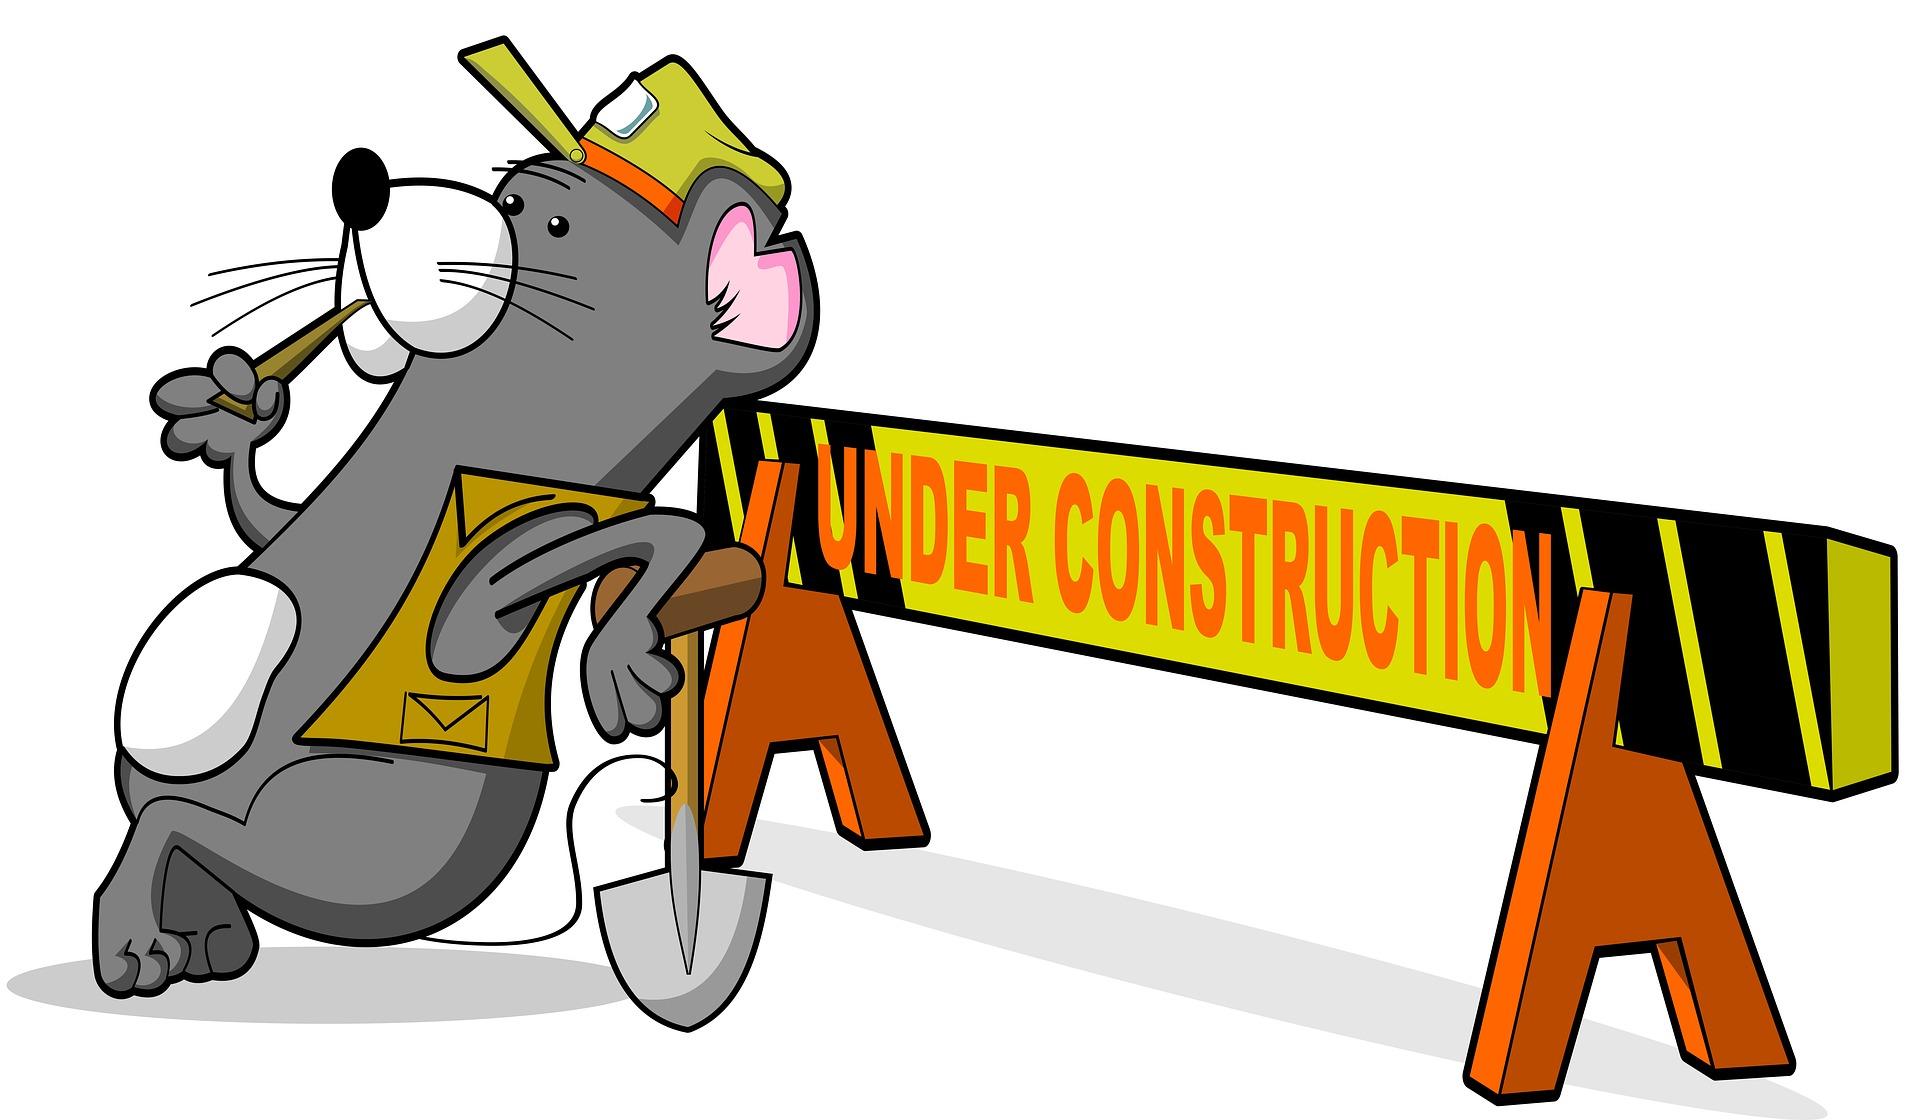 under-construction-4010445_1920